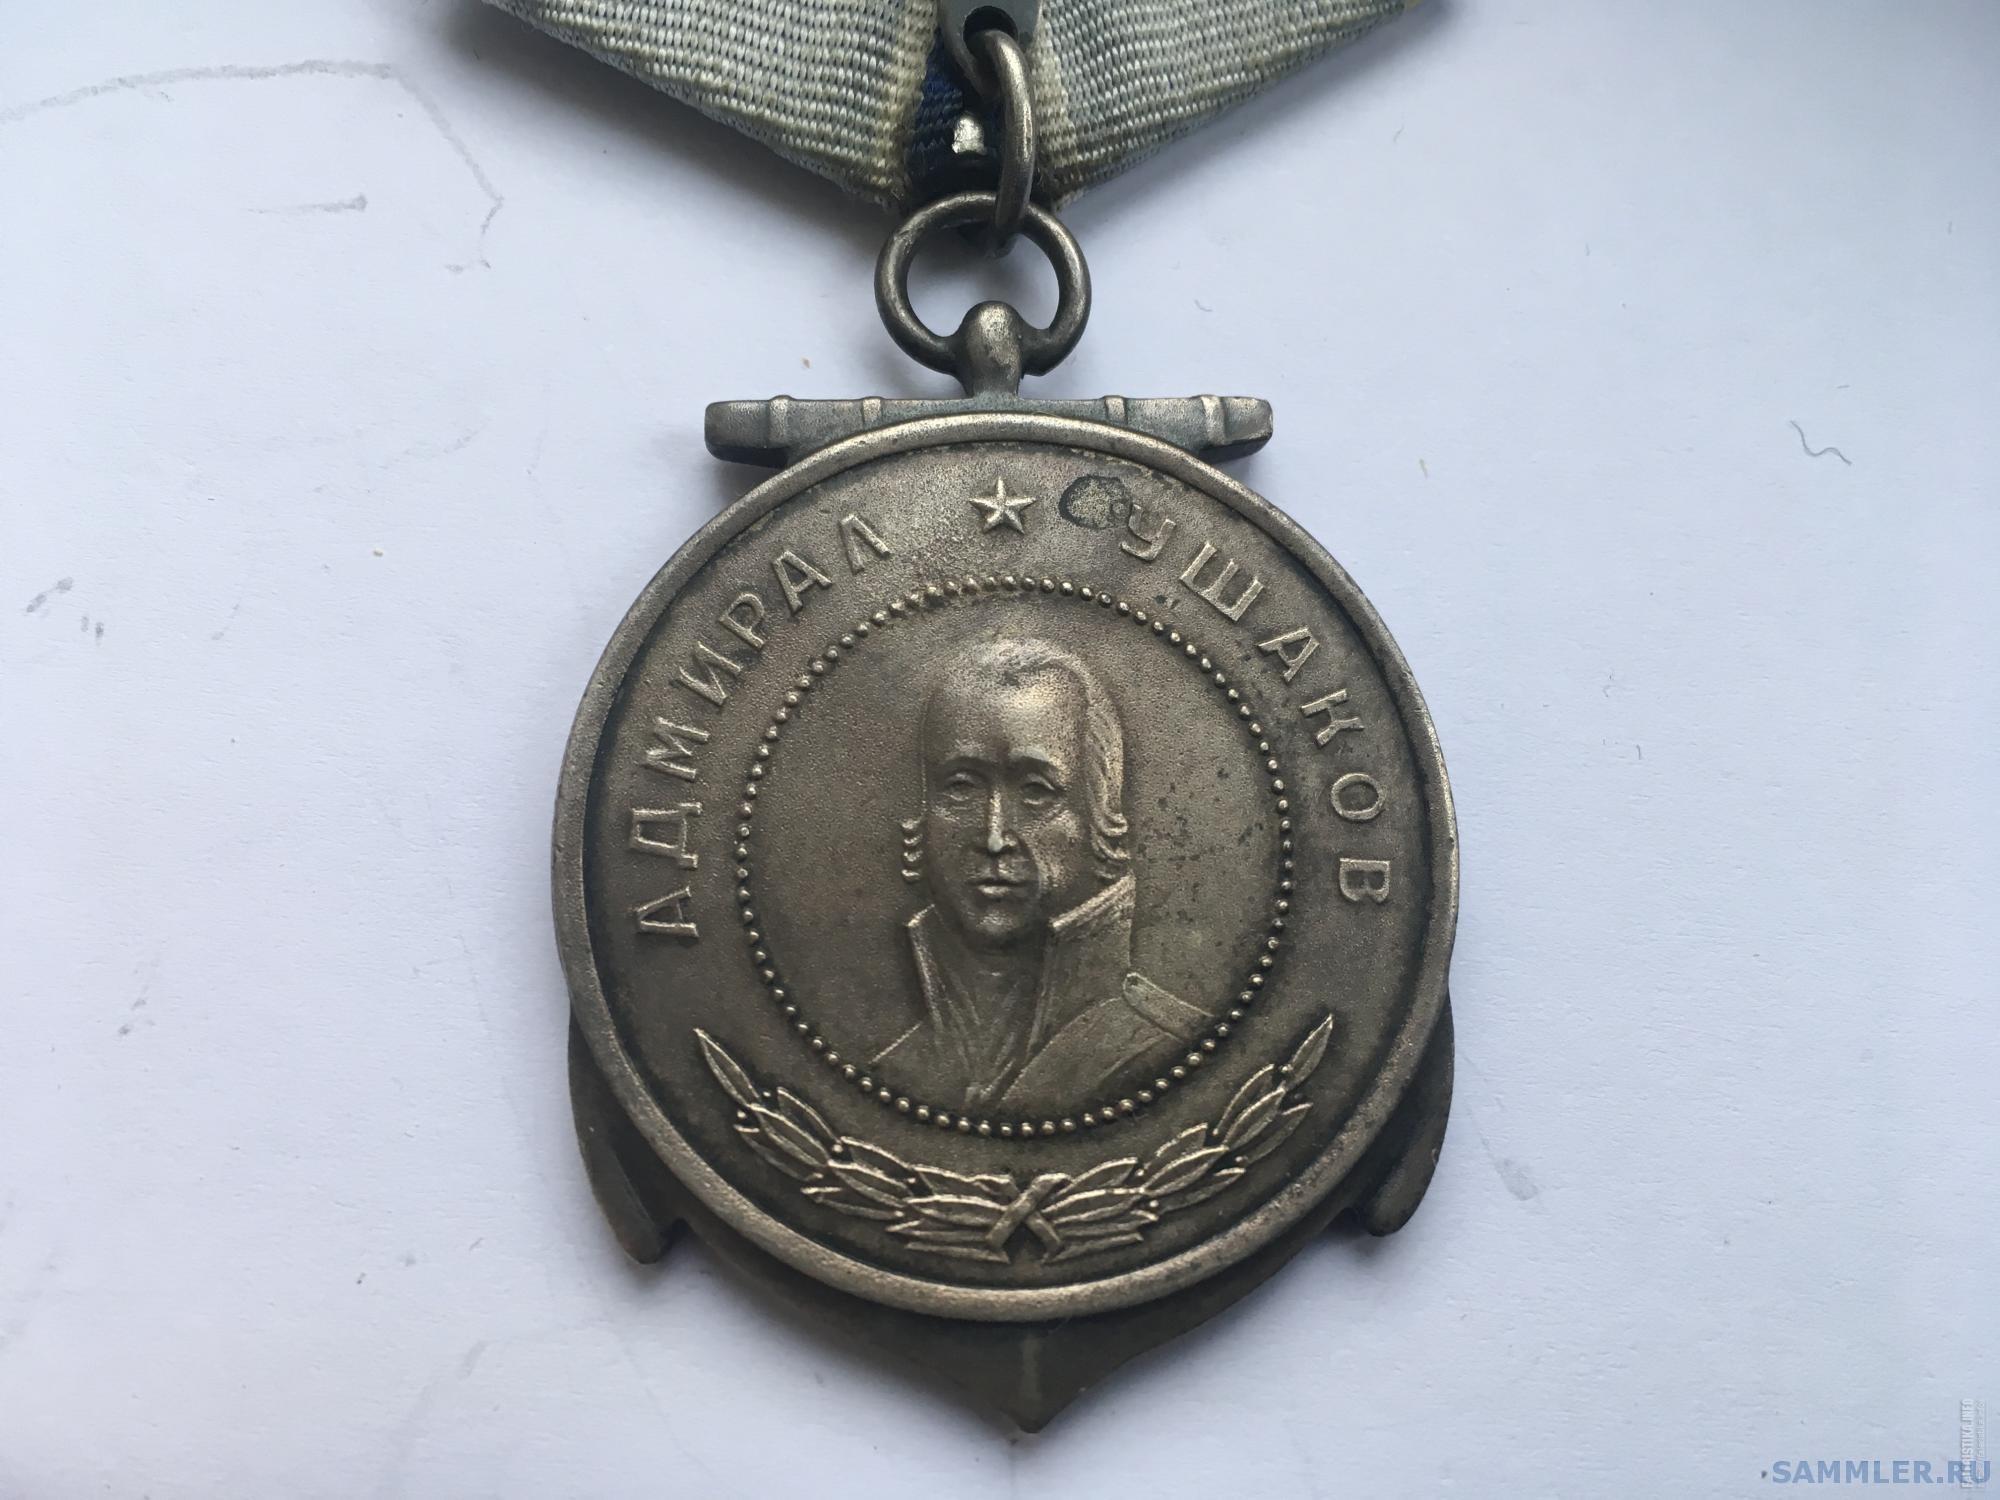 Медаль Ушакова с Документом для Юнг_6.jpg